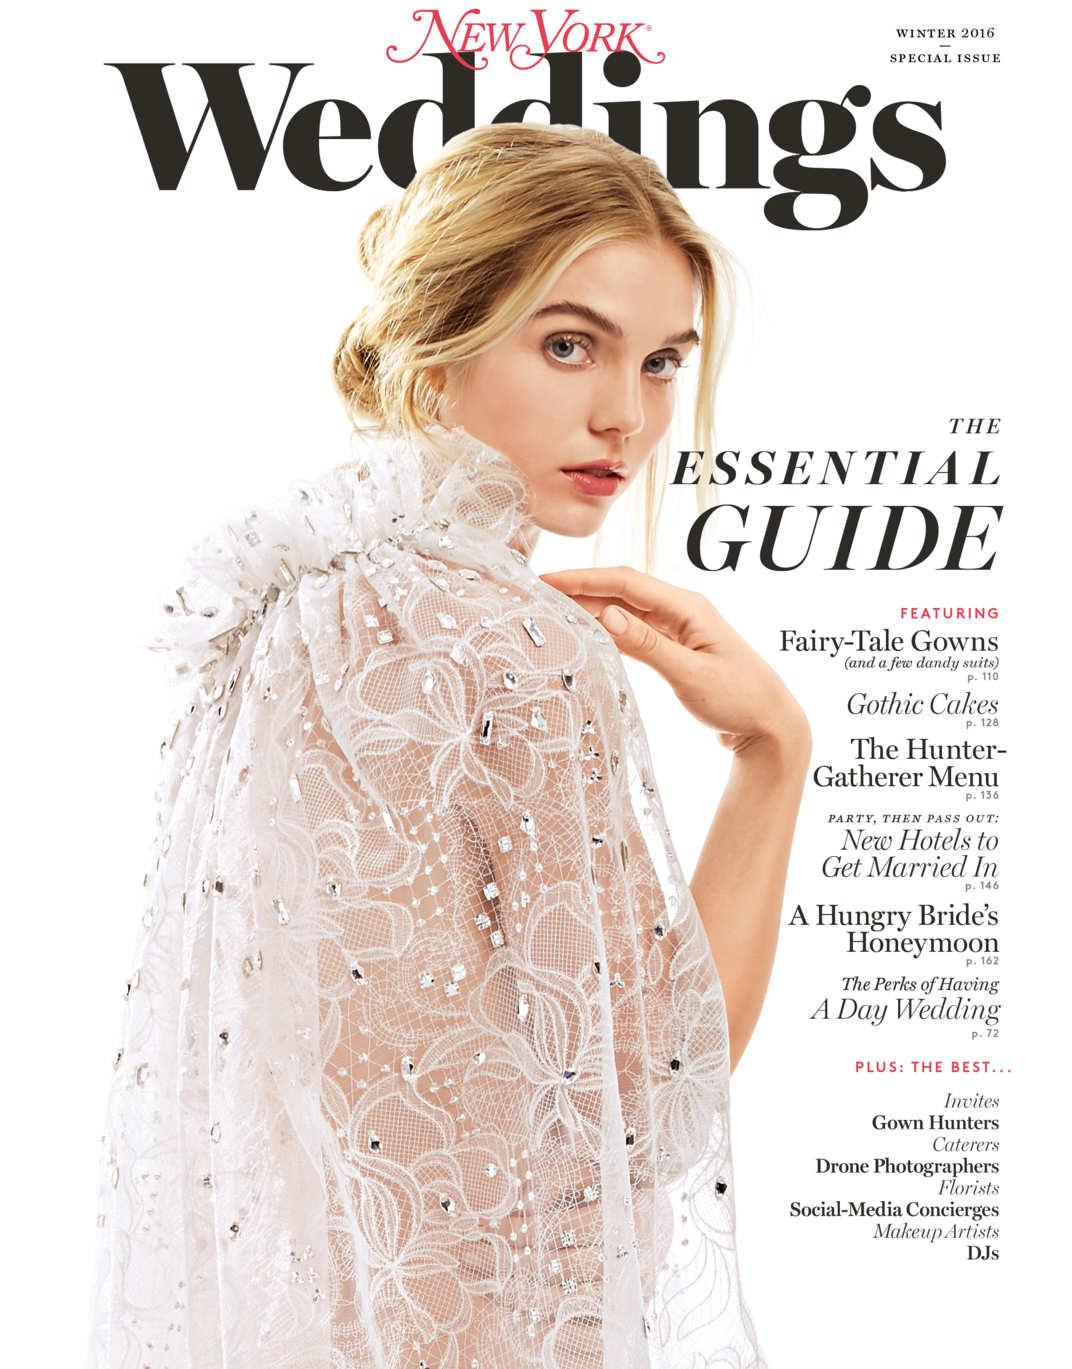 Weddings-Winter2016.w536.h804.2x.jpg